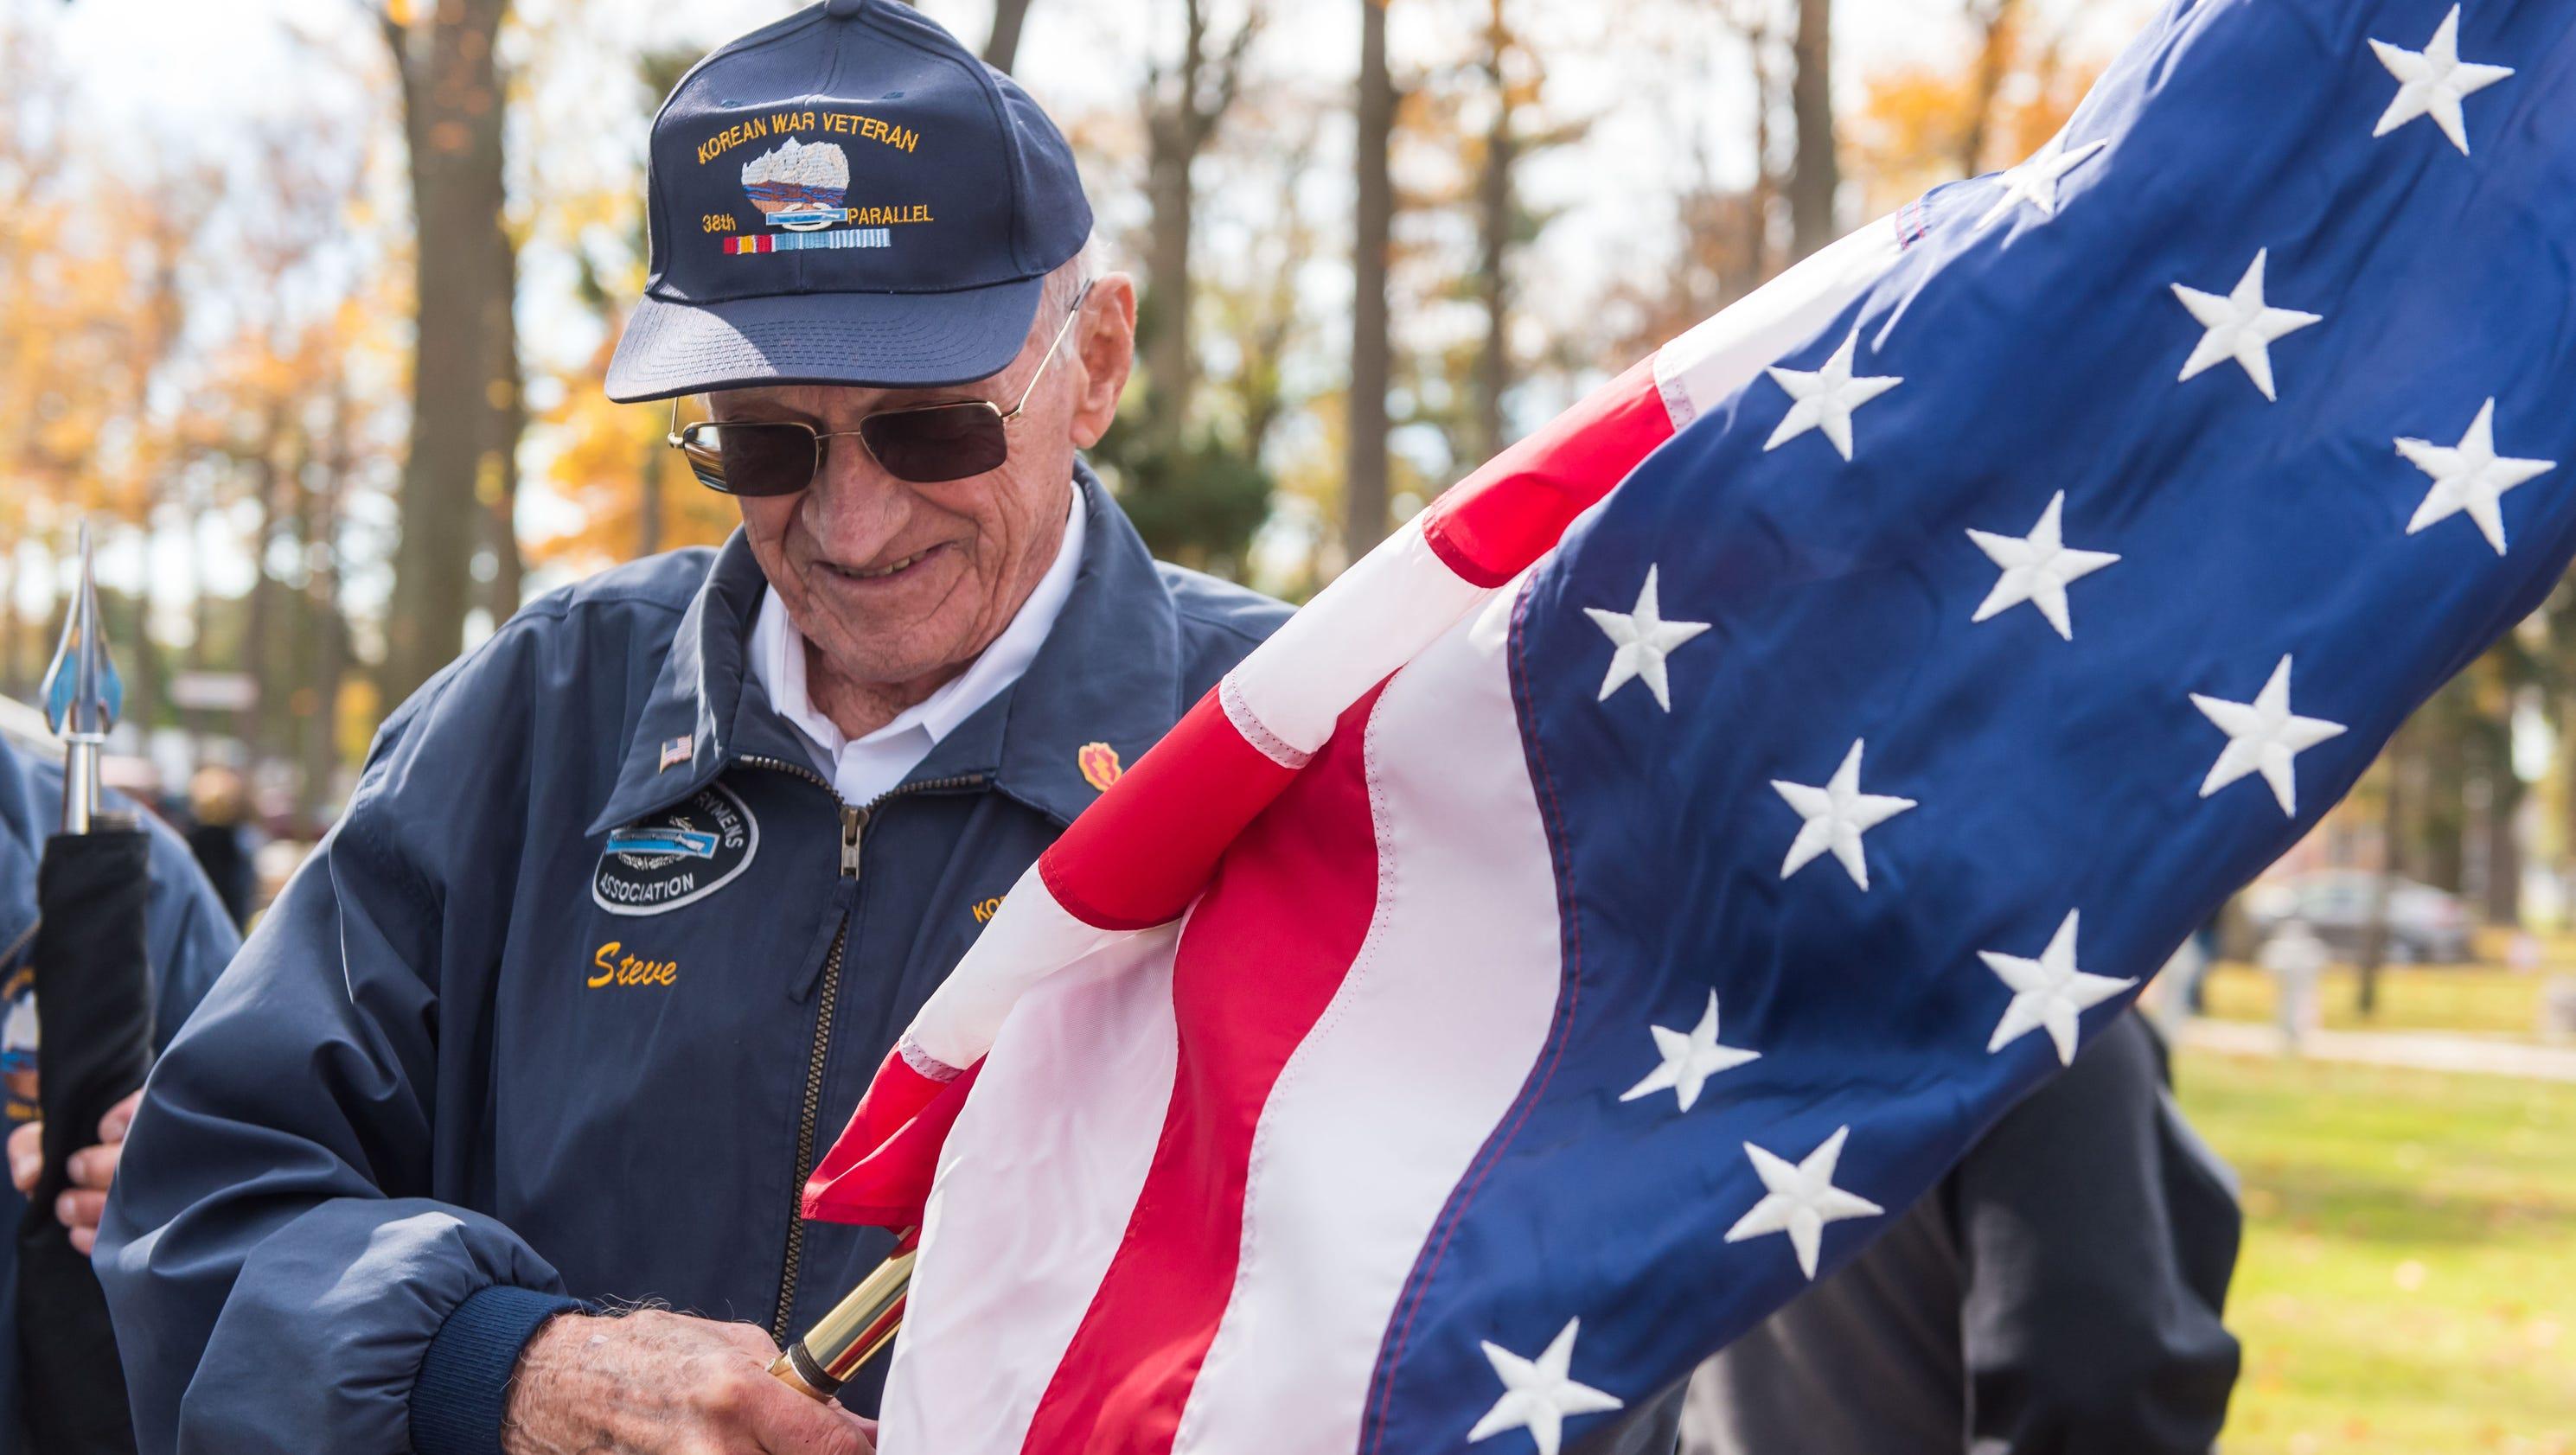 Veterans Honored At Vineland Ceremony